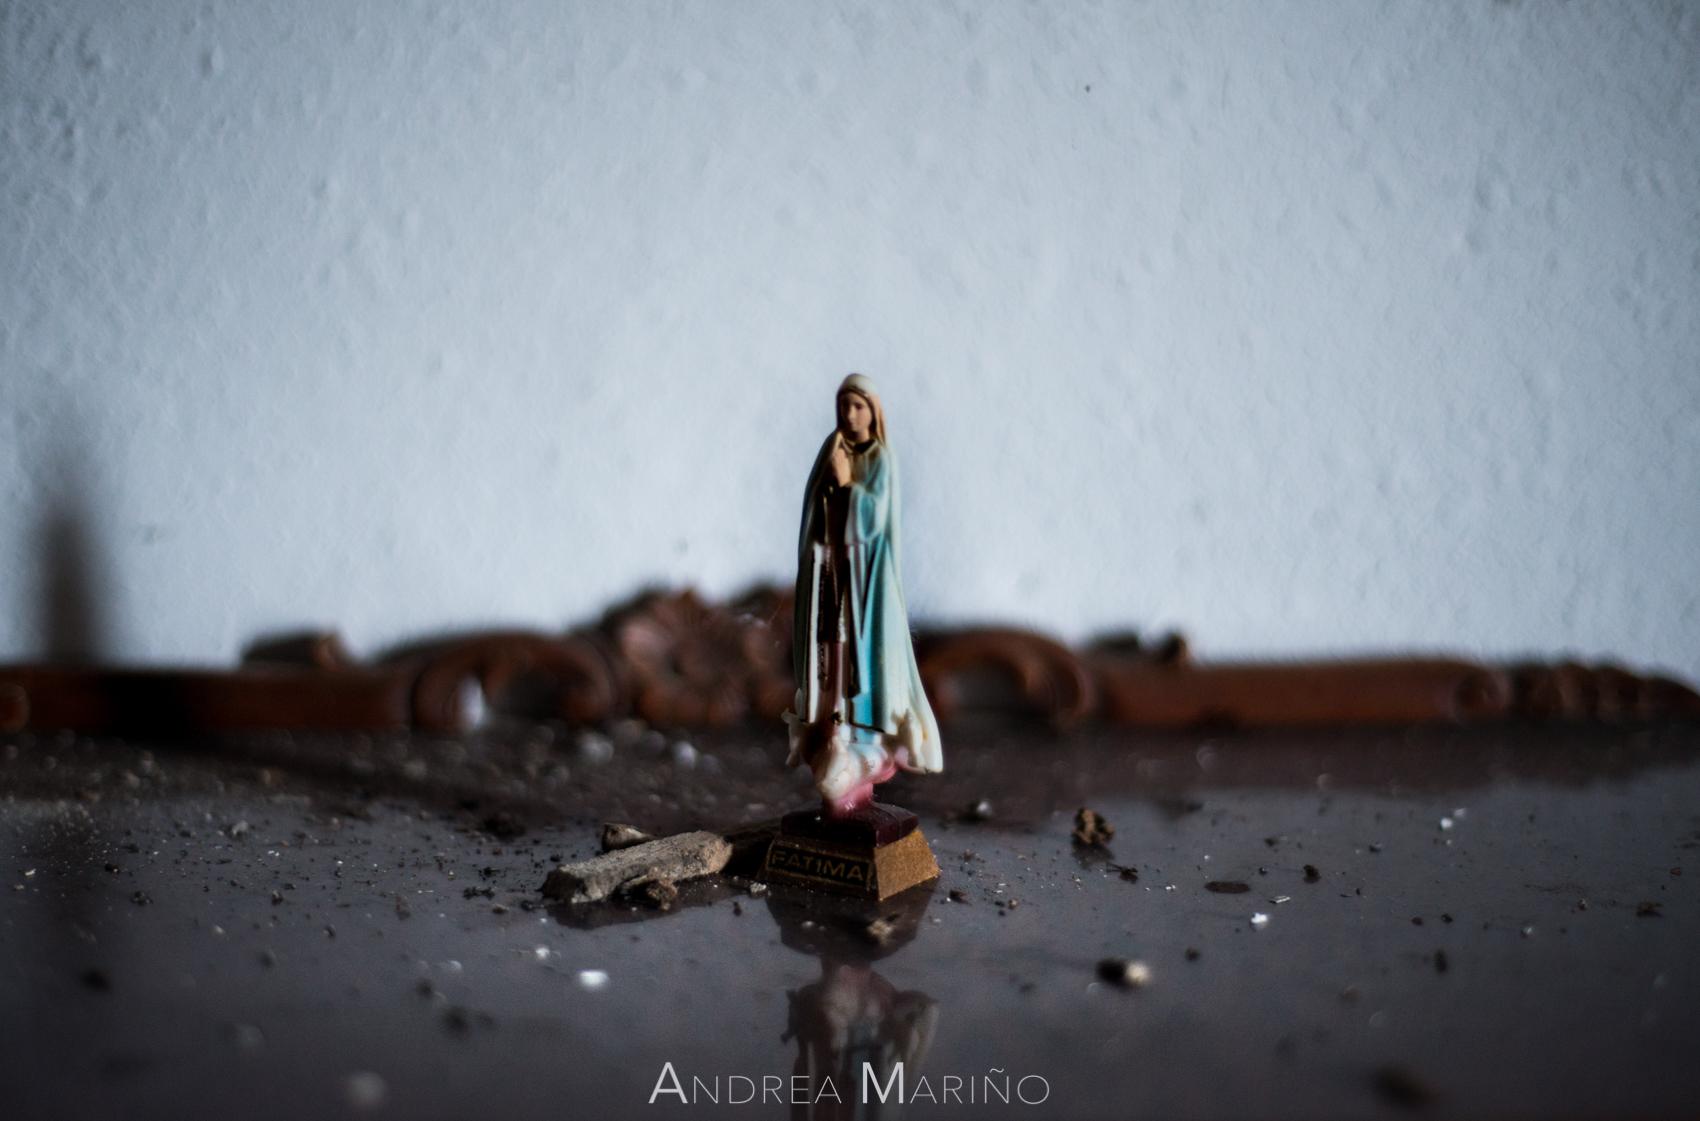 Andrea Mariño. Casanova. Lugo. 2017